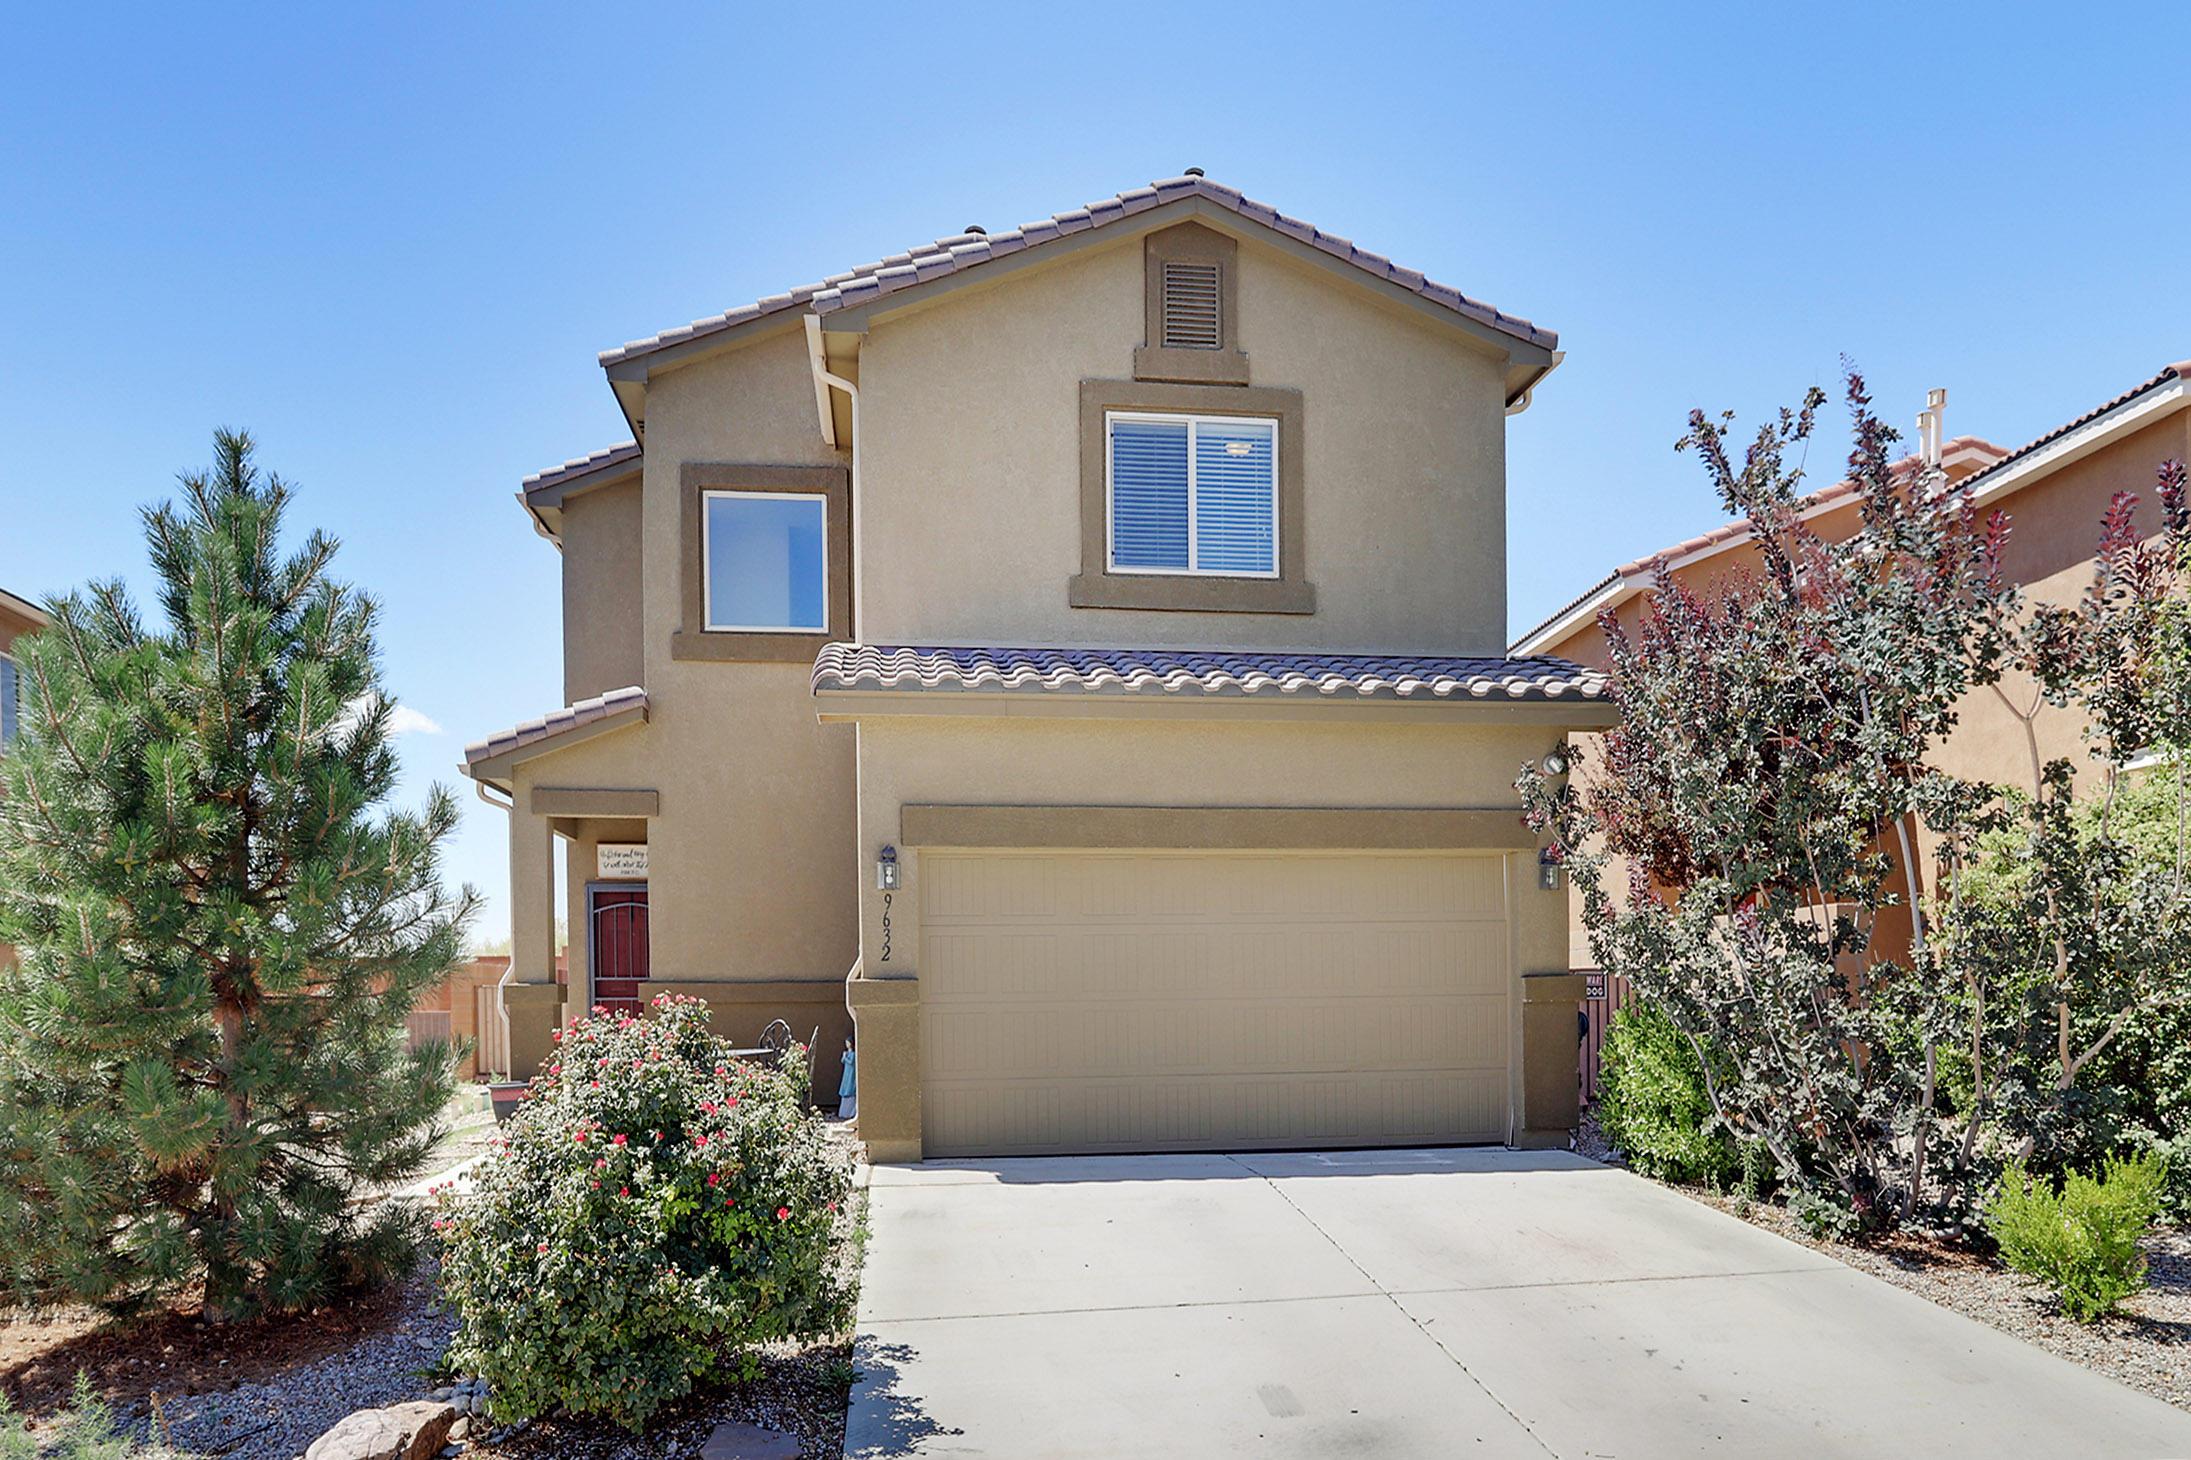 9632 NW Mirasol Avenue, Northwest Albuquerque and Northwest Heights, New Mexico